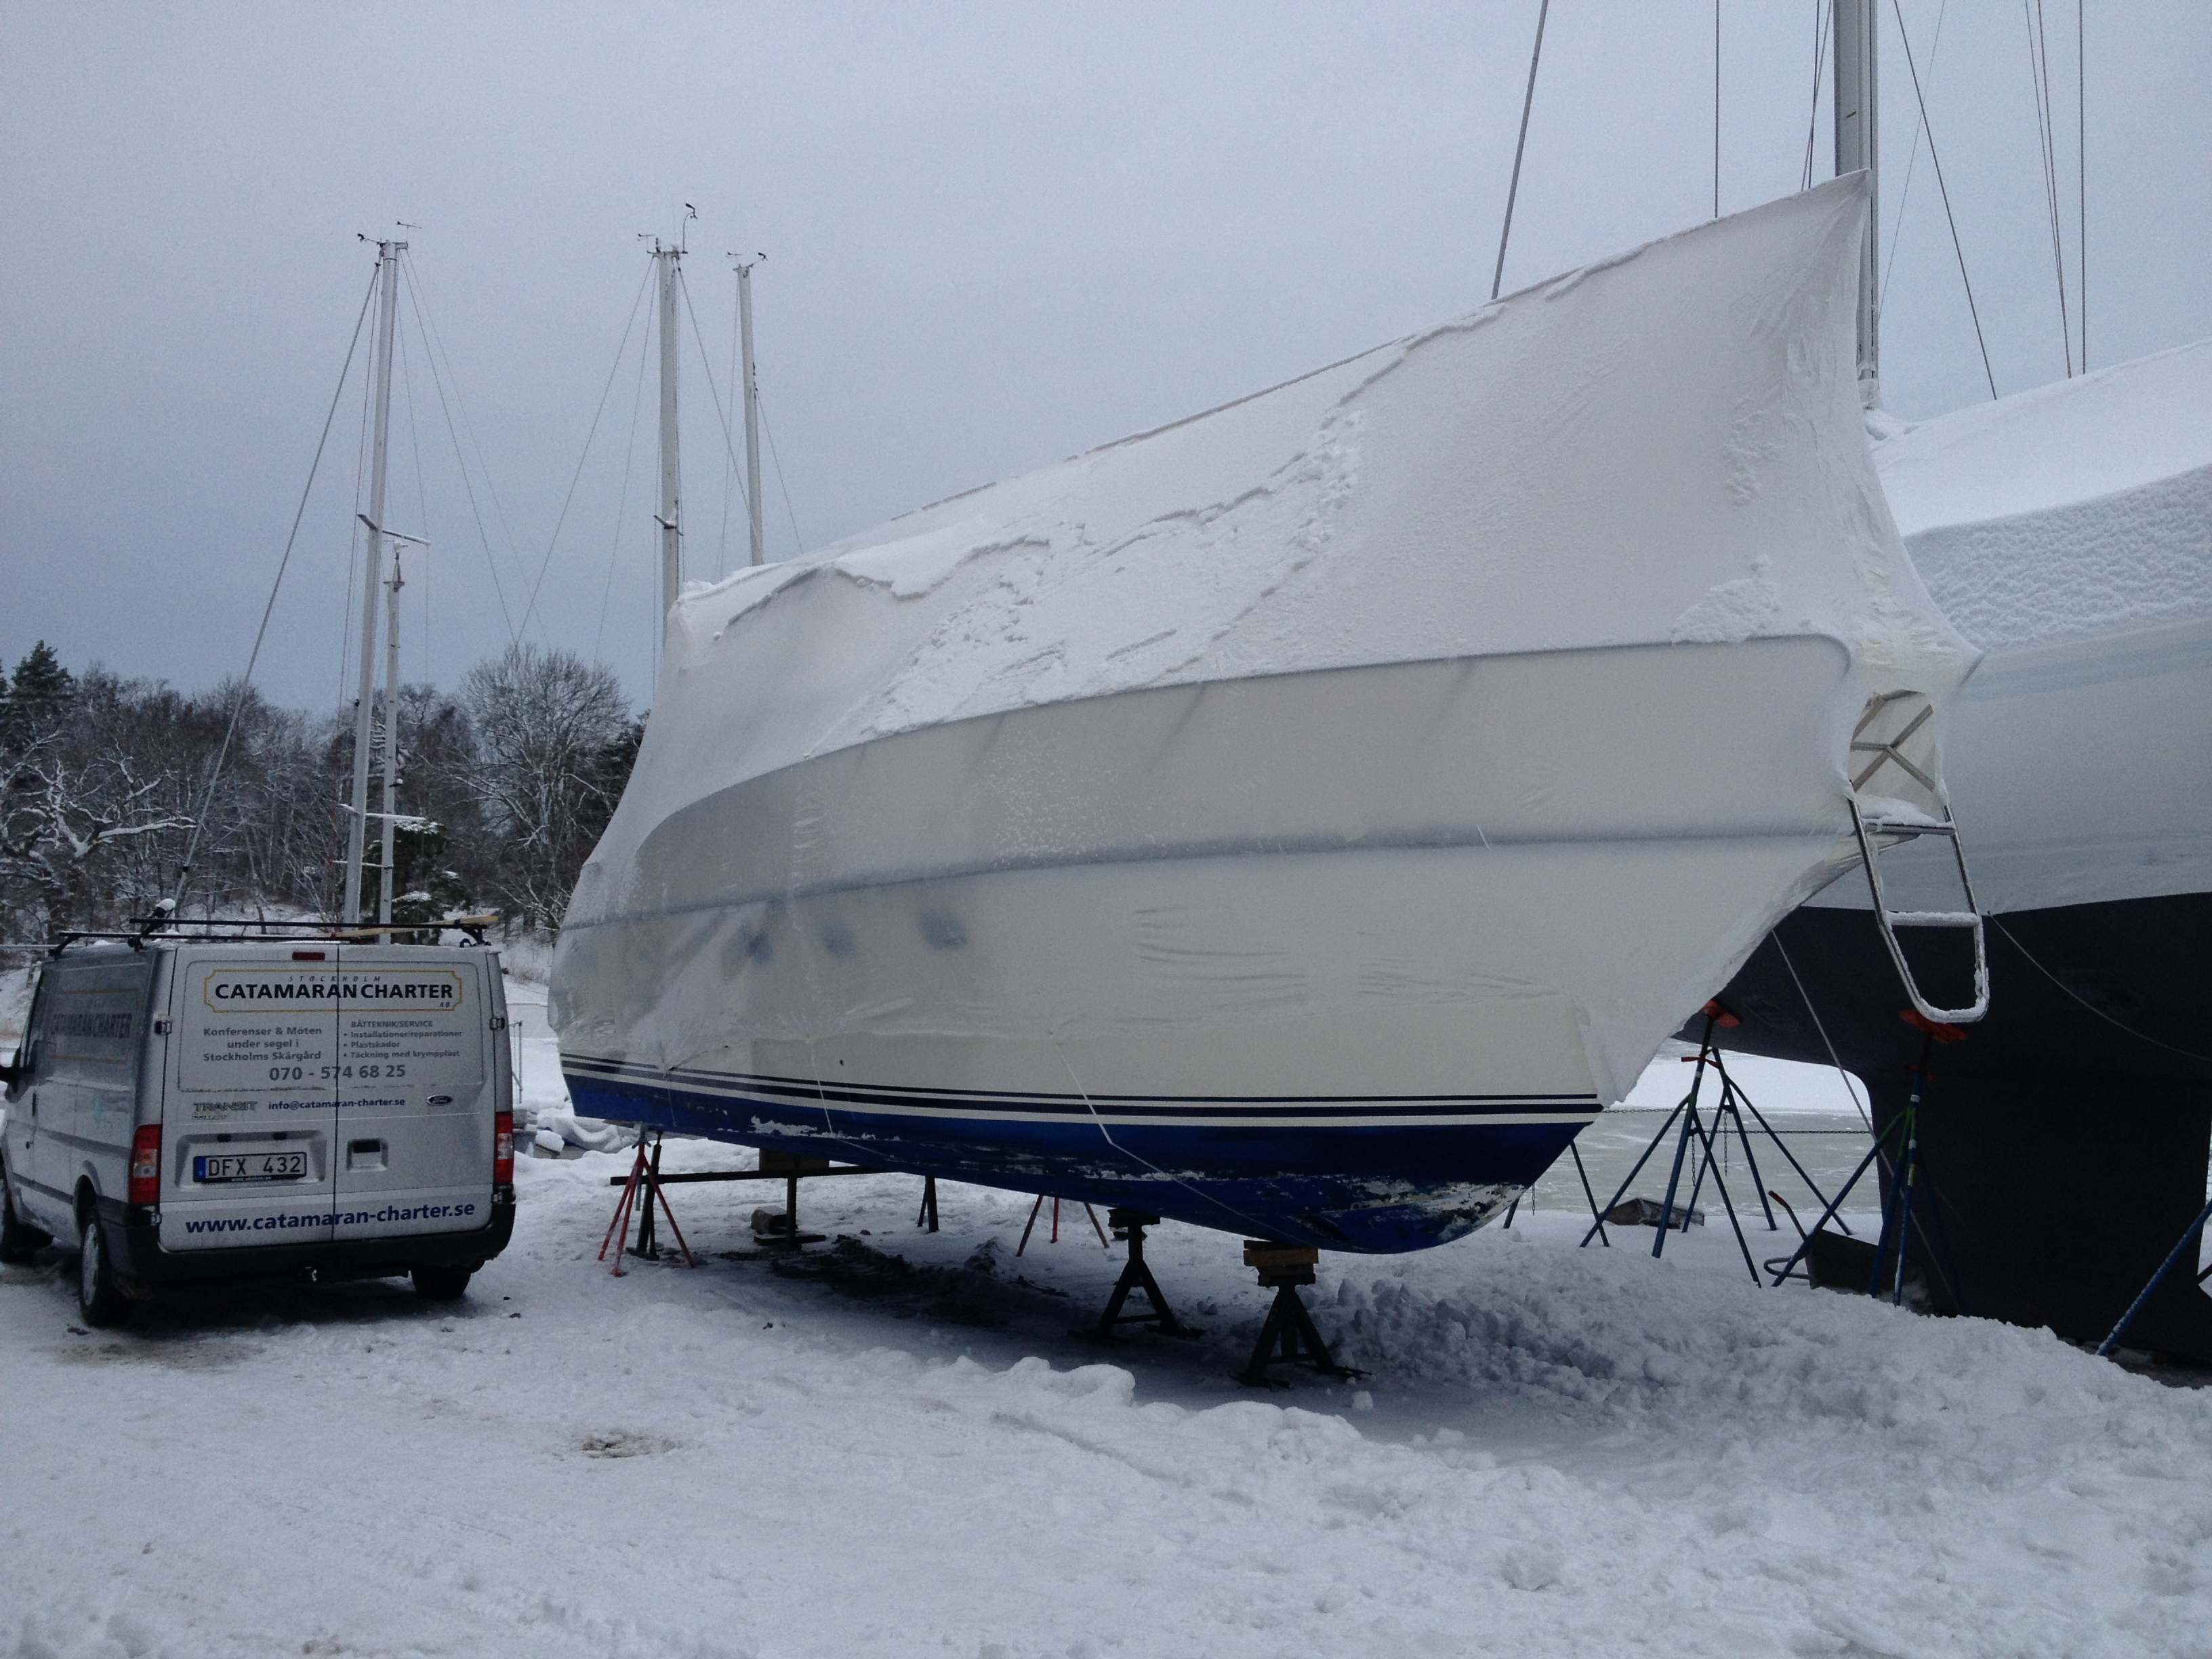 Krympplast båt stockholm